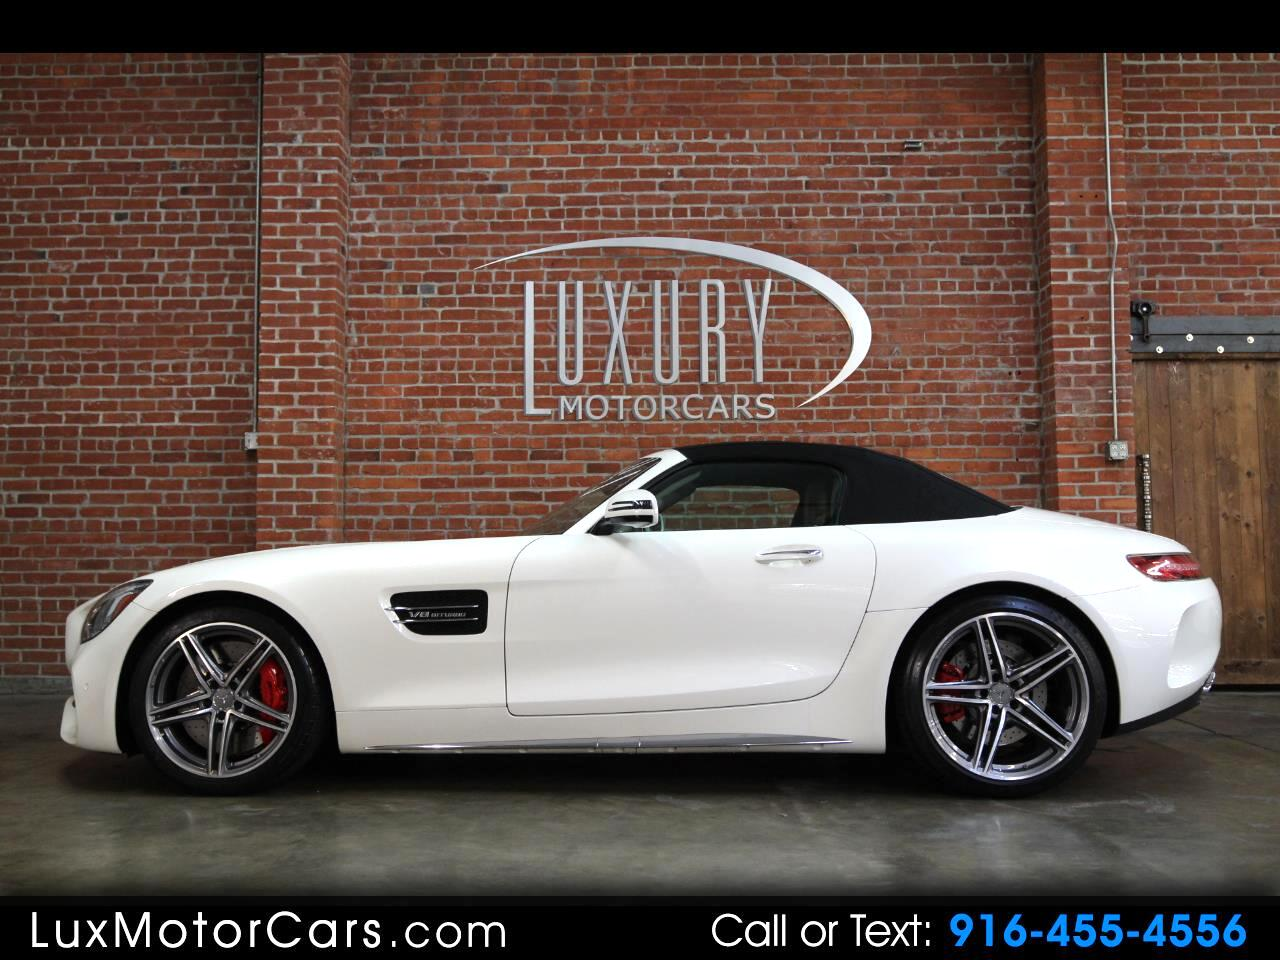 Used 2018 Mercedes Benz Amg Gt C Cabrio For Sale In Sacramento Ca 95819 Luxury Motorcars Llc